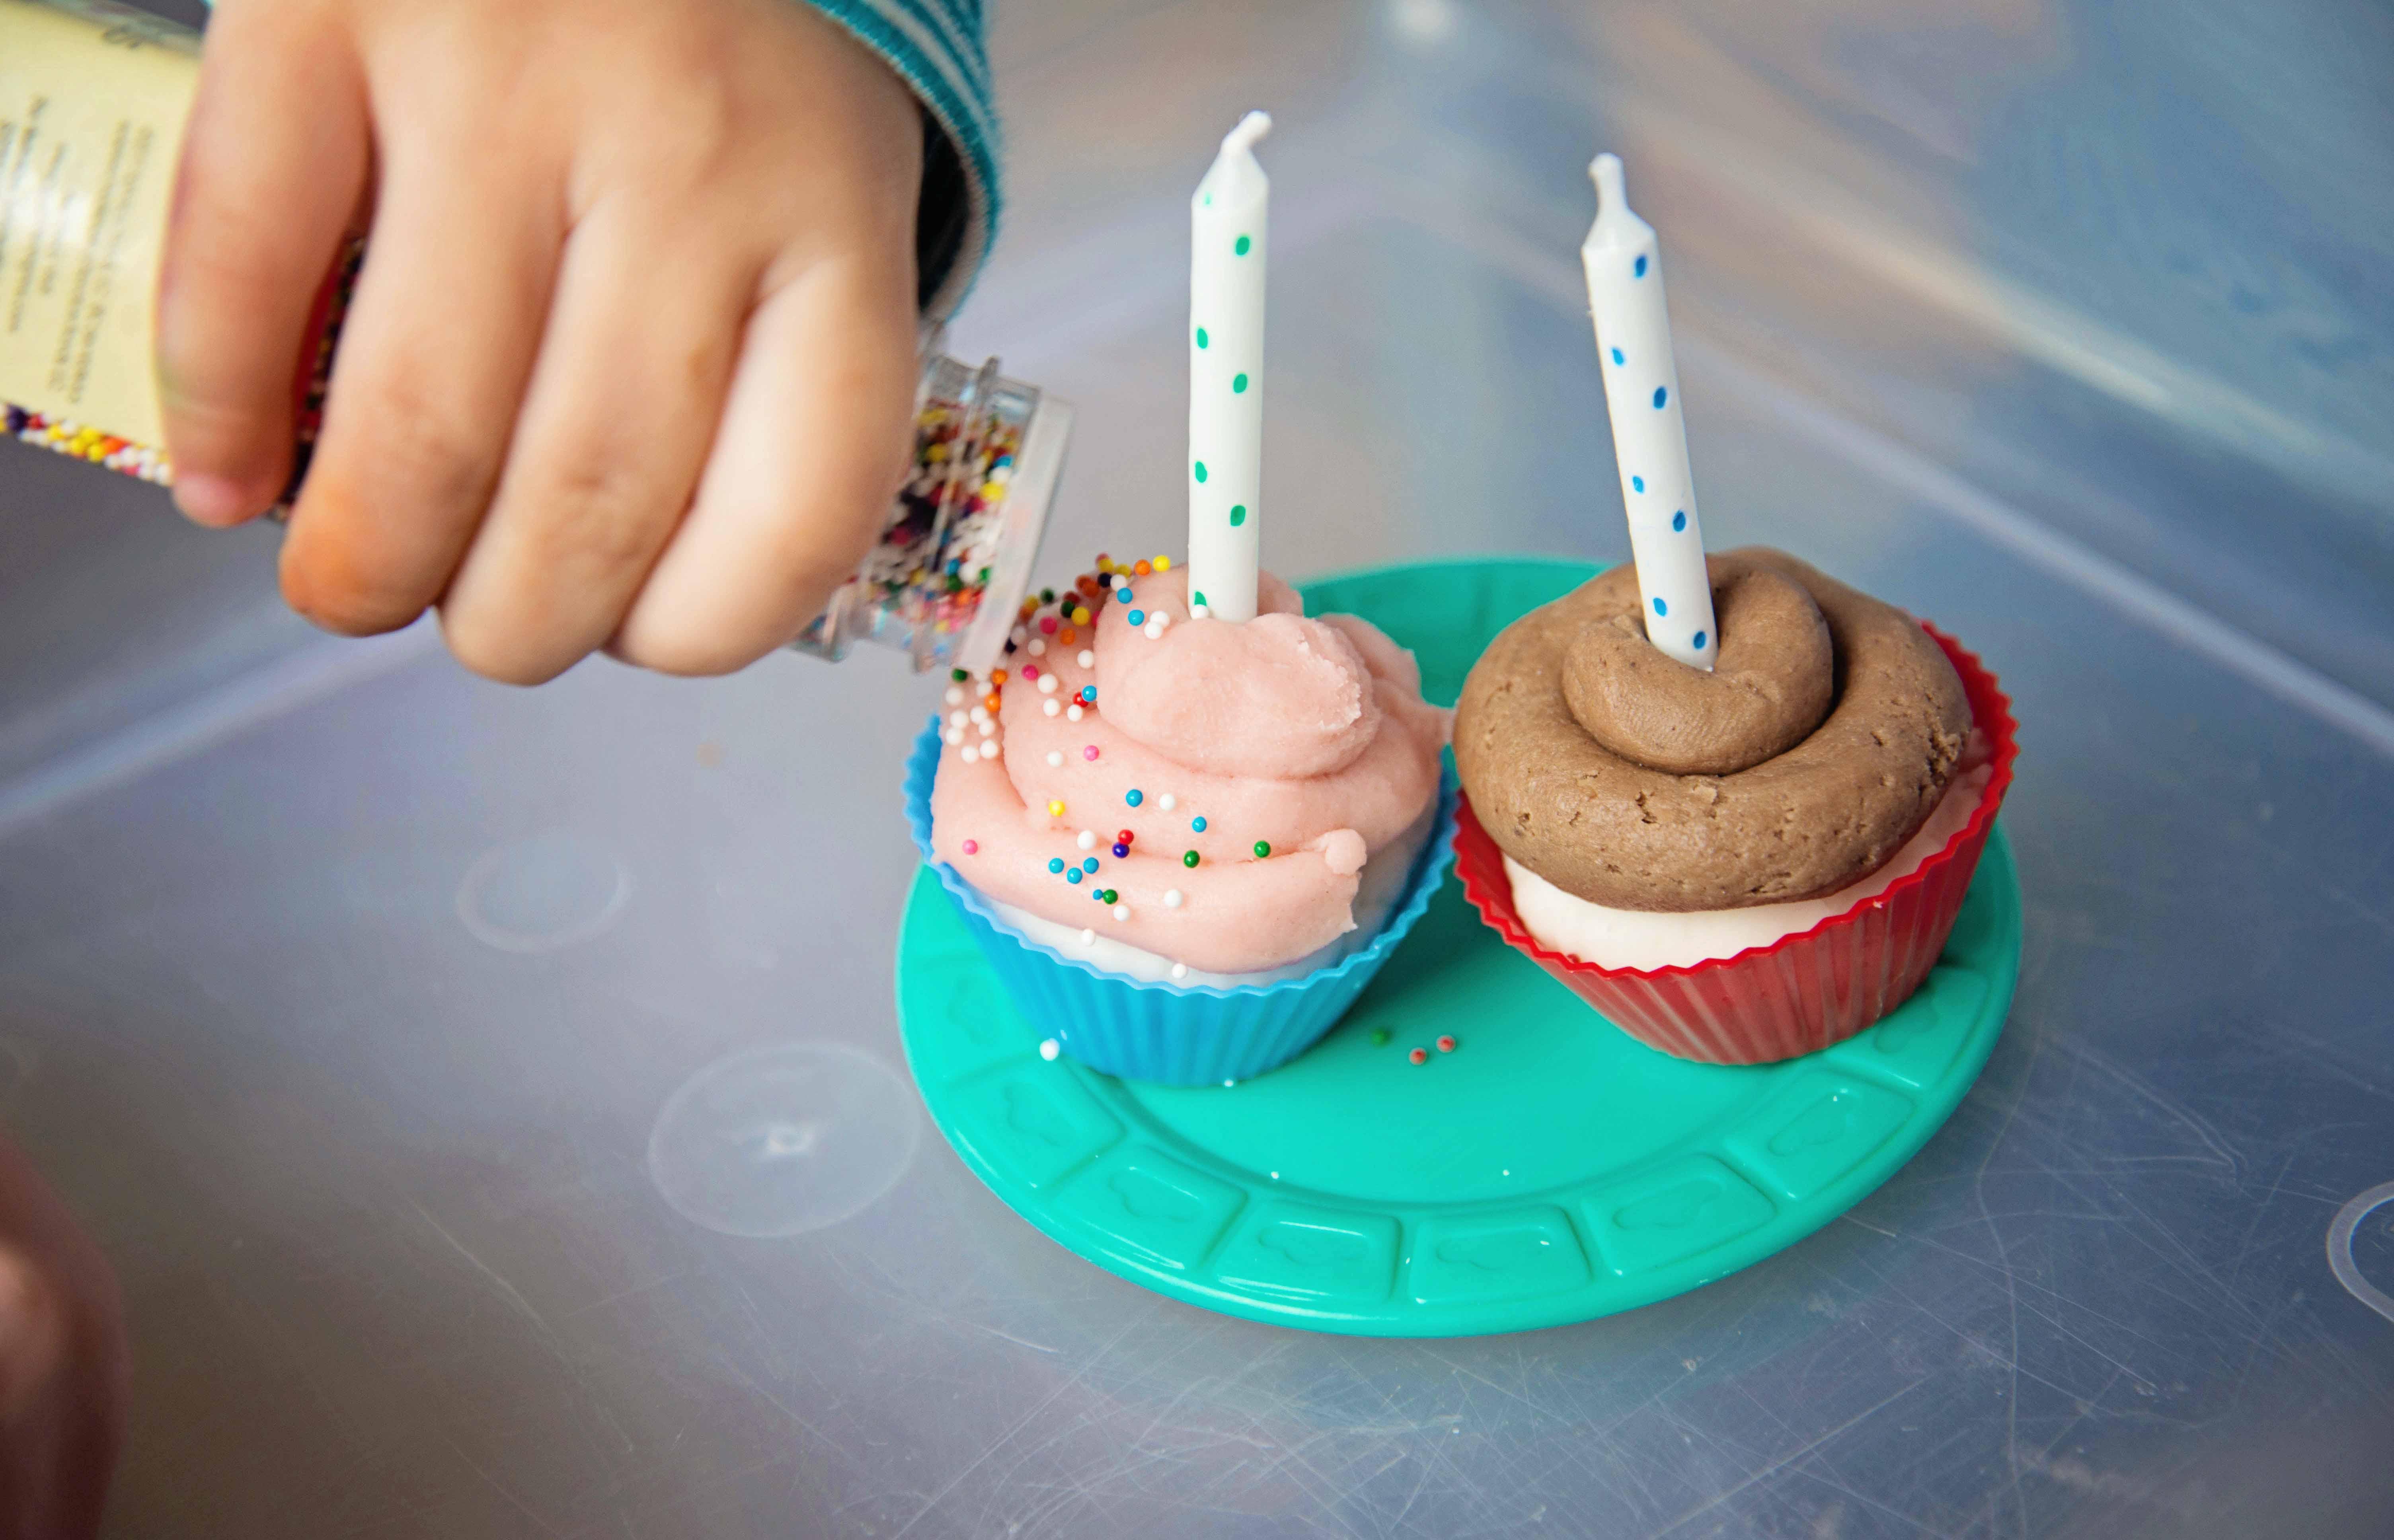 Babes in Deutschland, Play dough cupcake bake shop in the sensory bin!